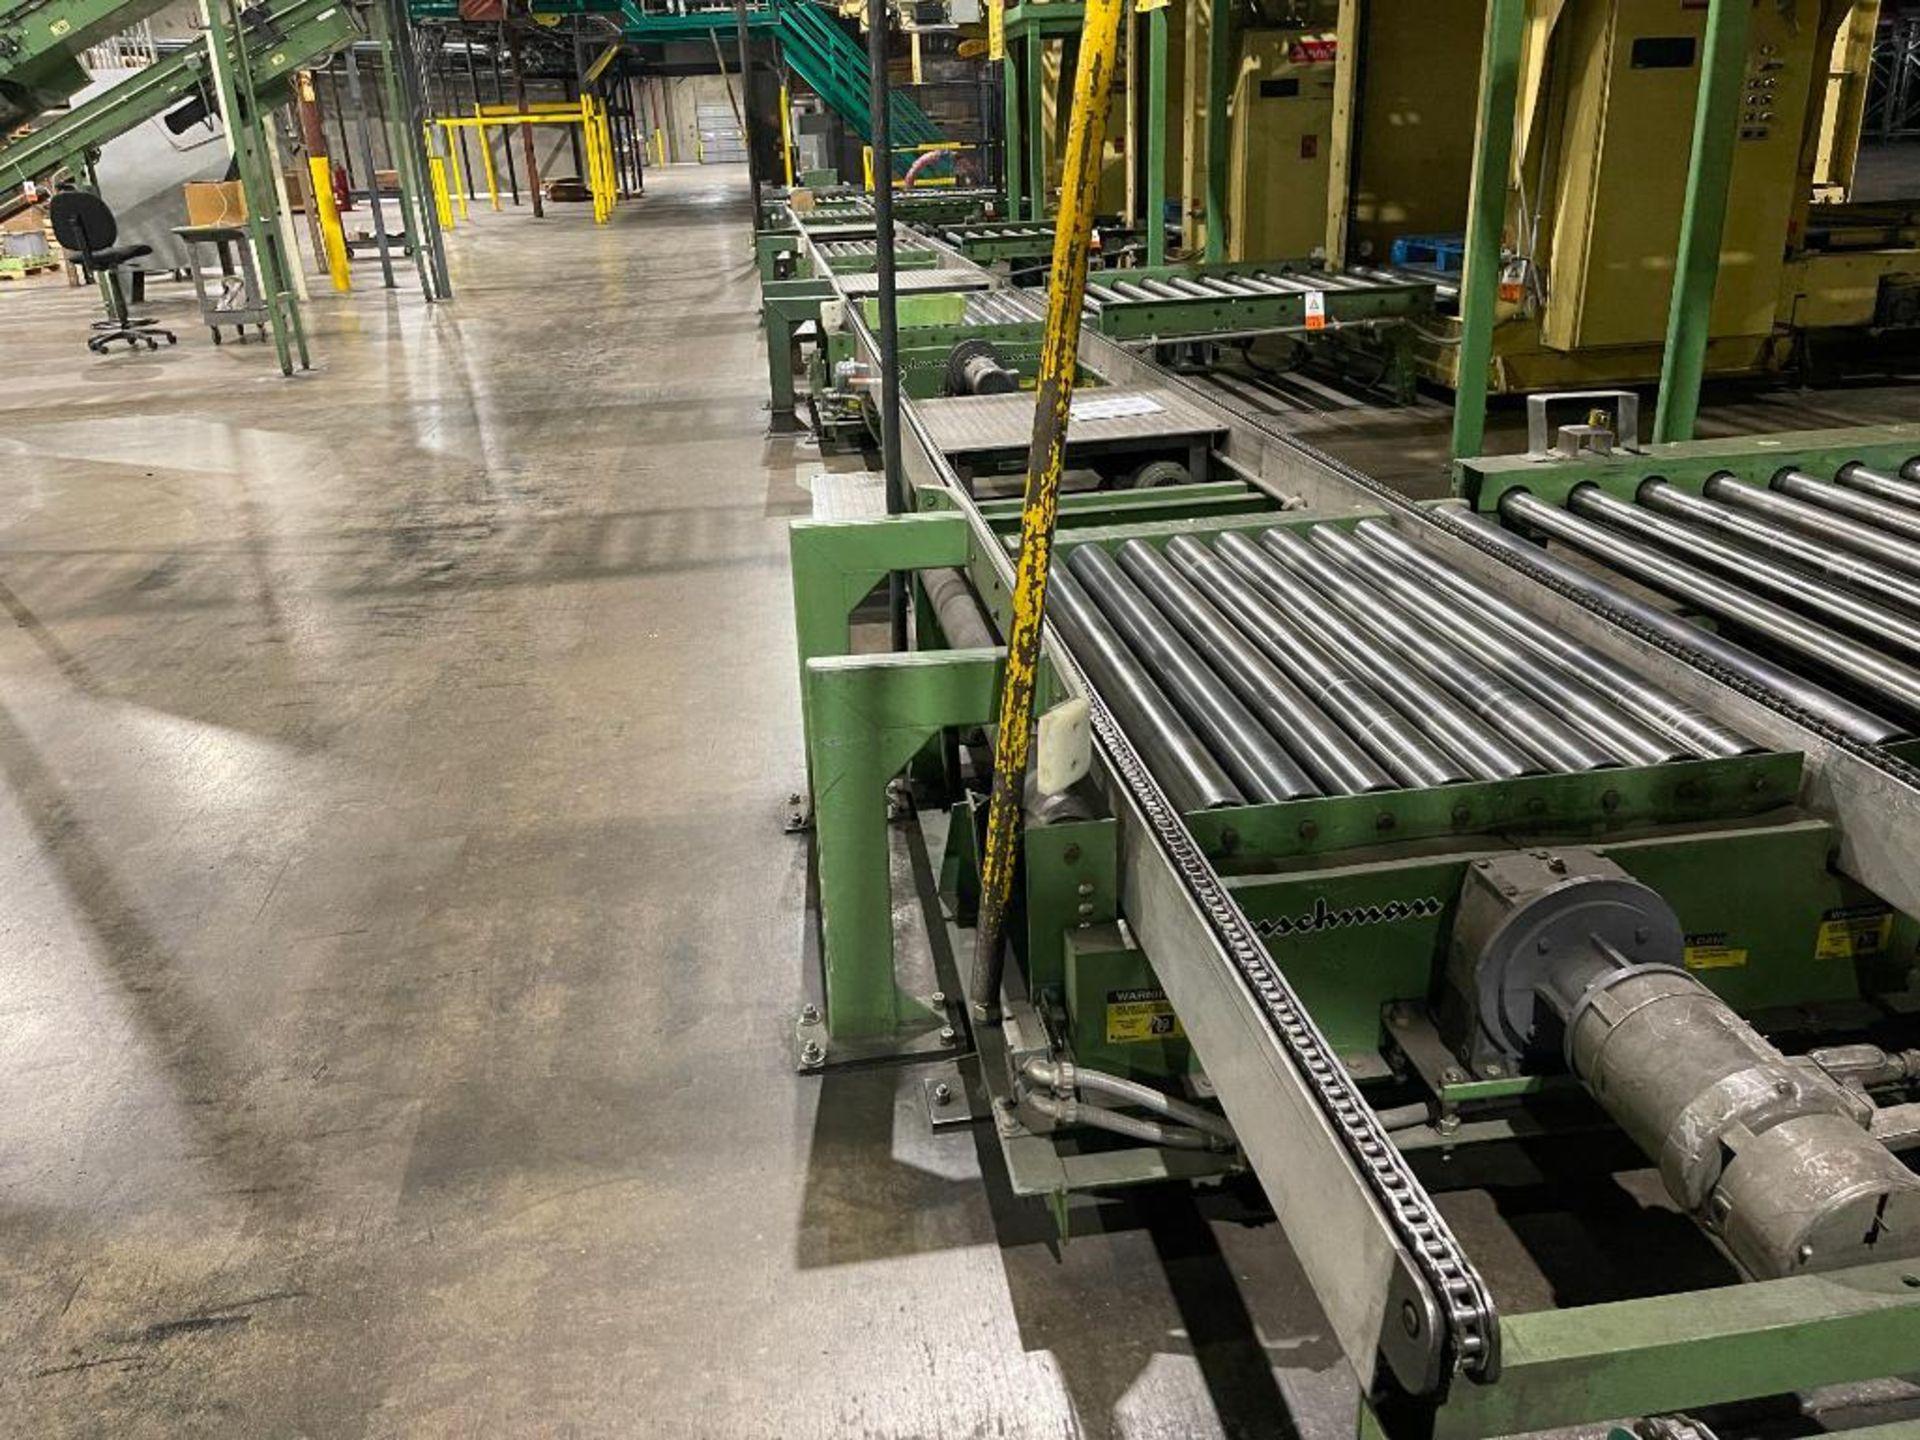 Buschman full pallet conveyor - Image 2 of 10